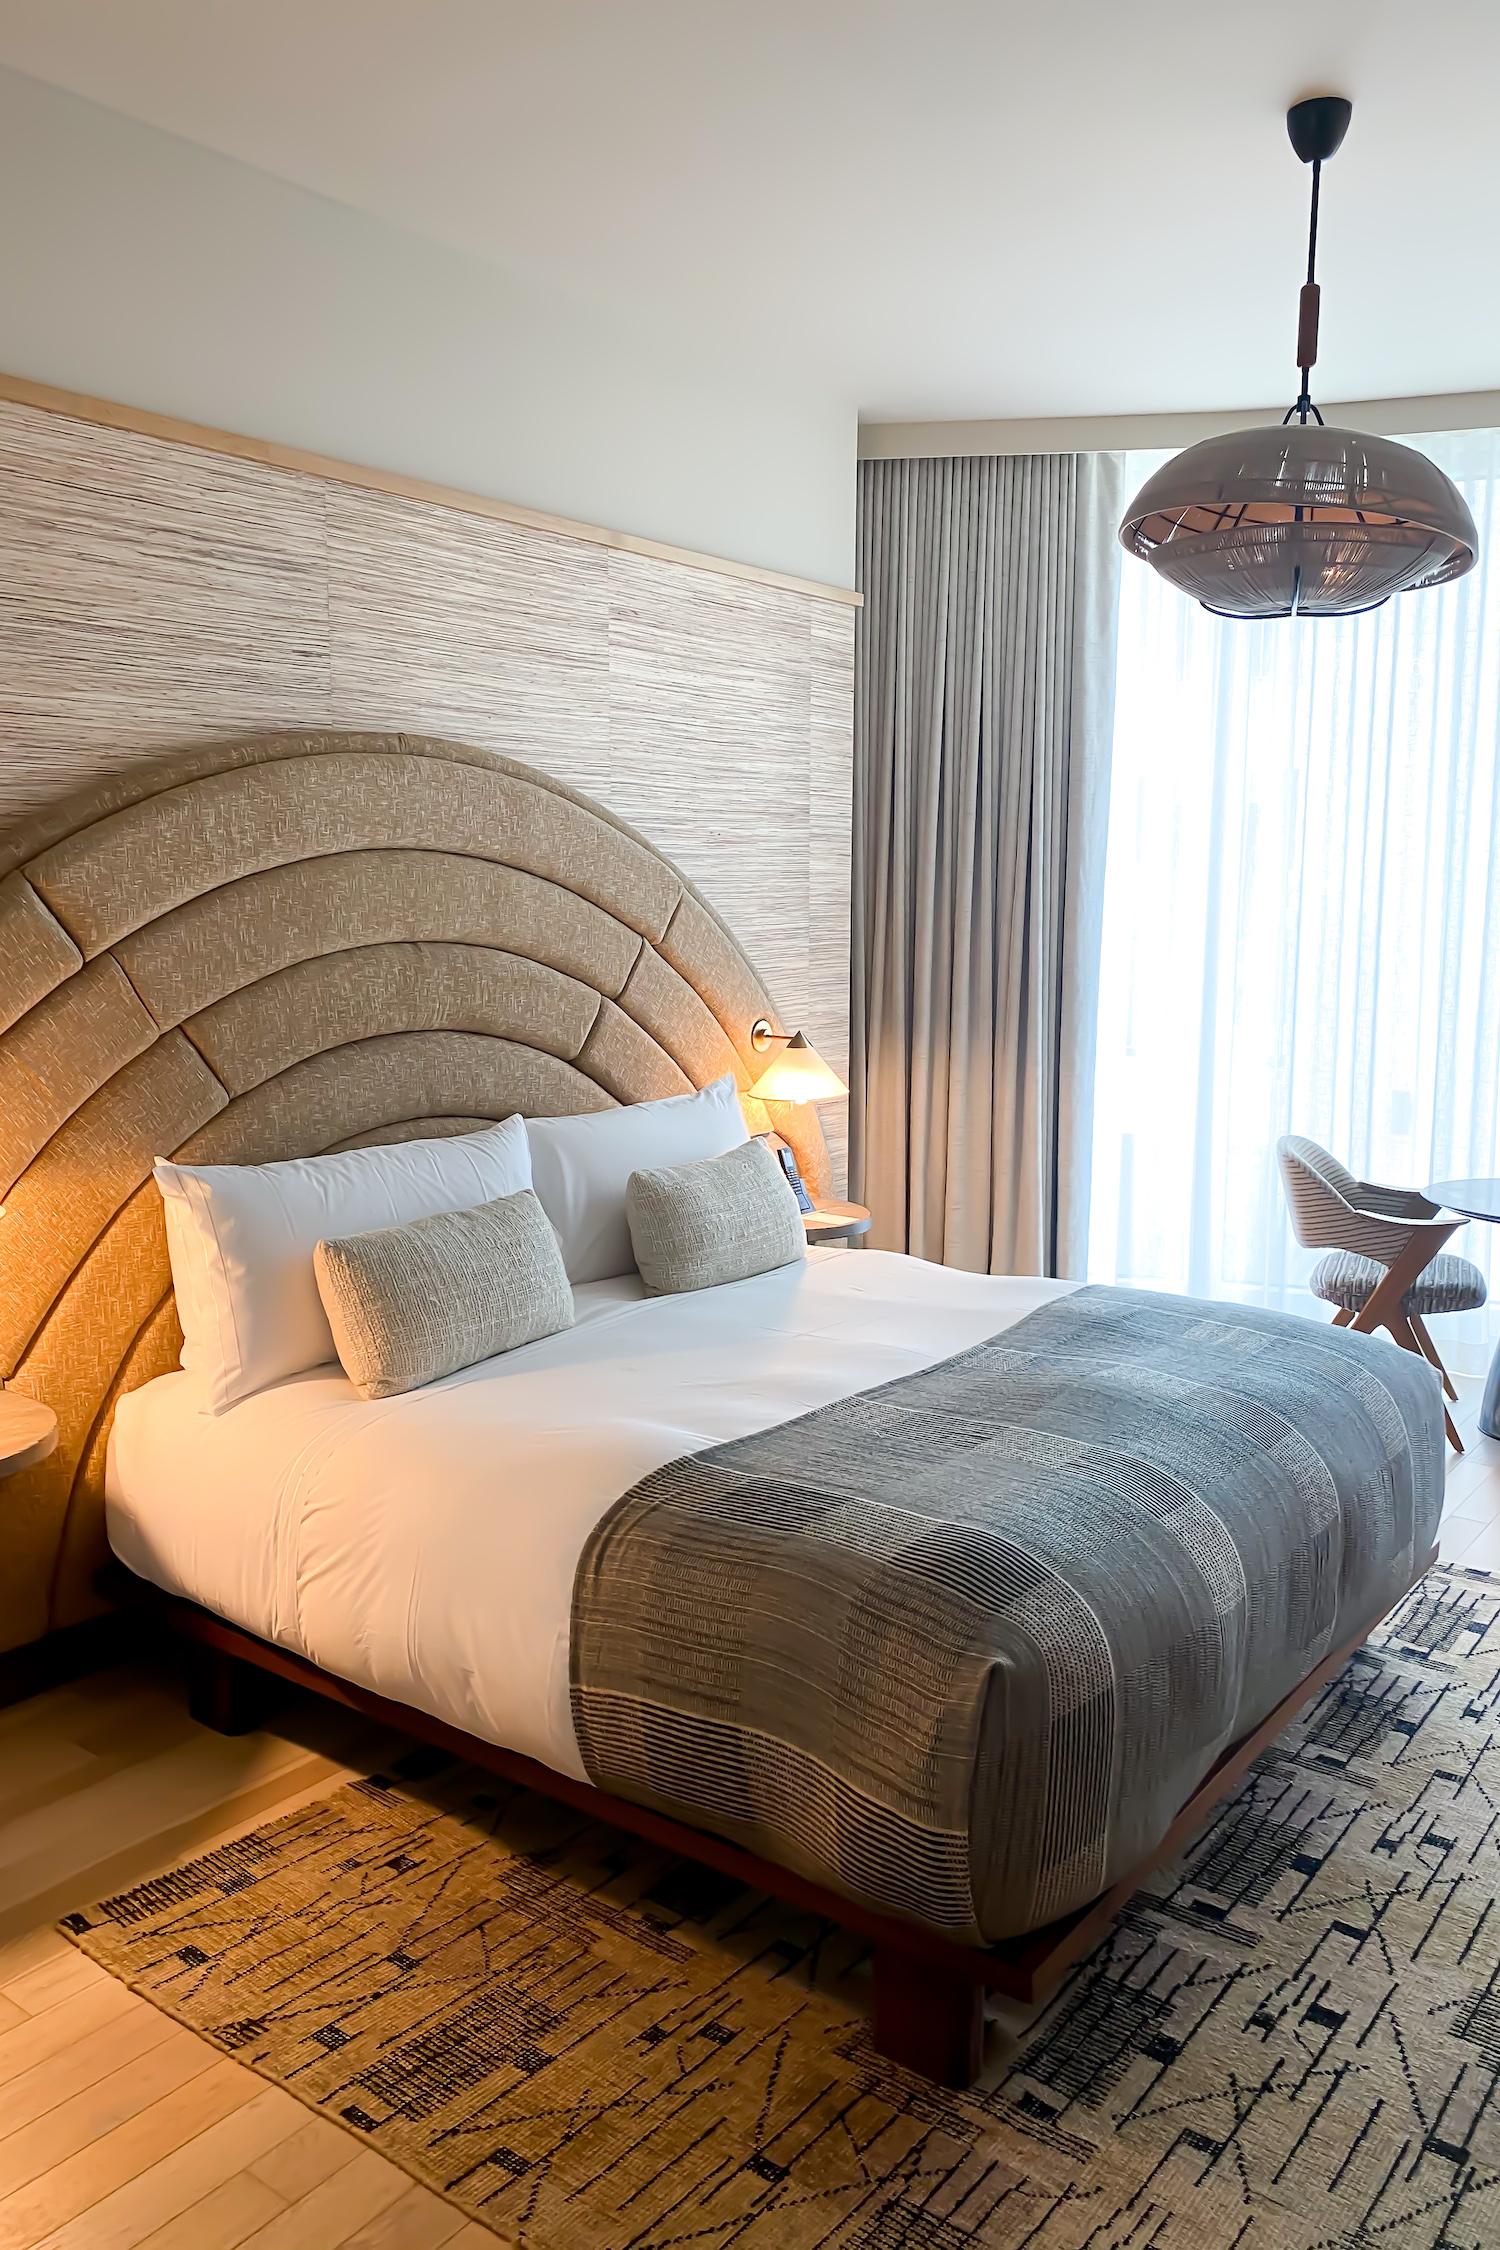 The Proper Hotel in Santa Monica bed